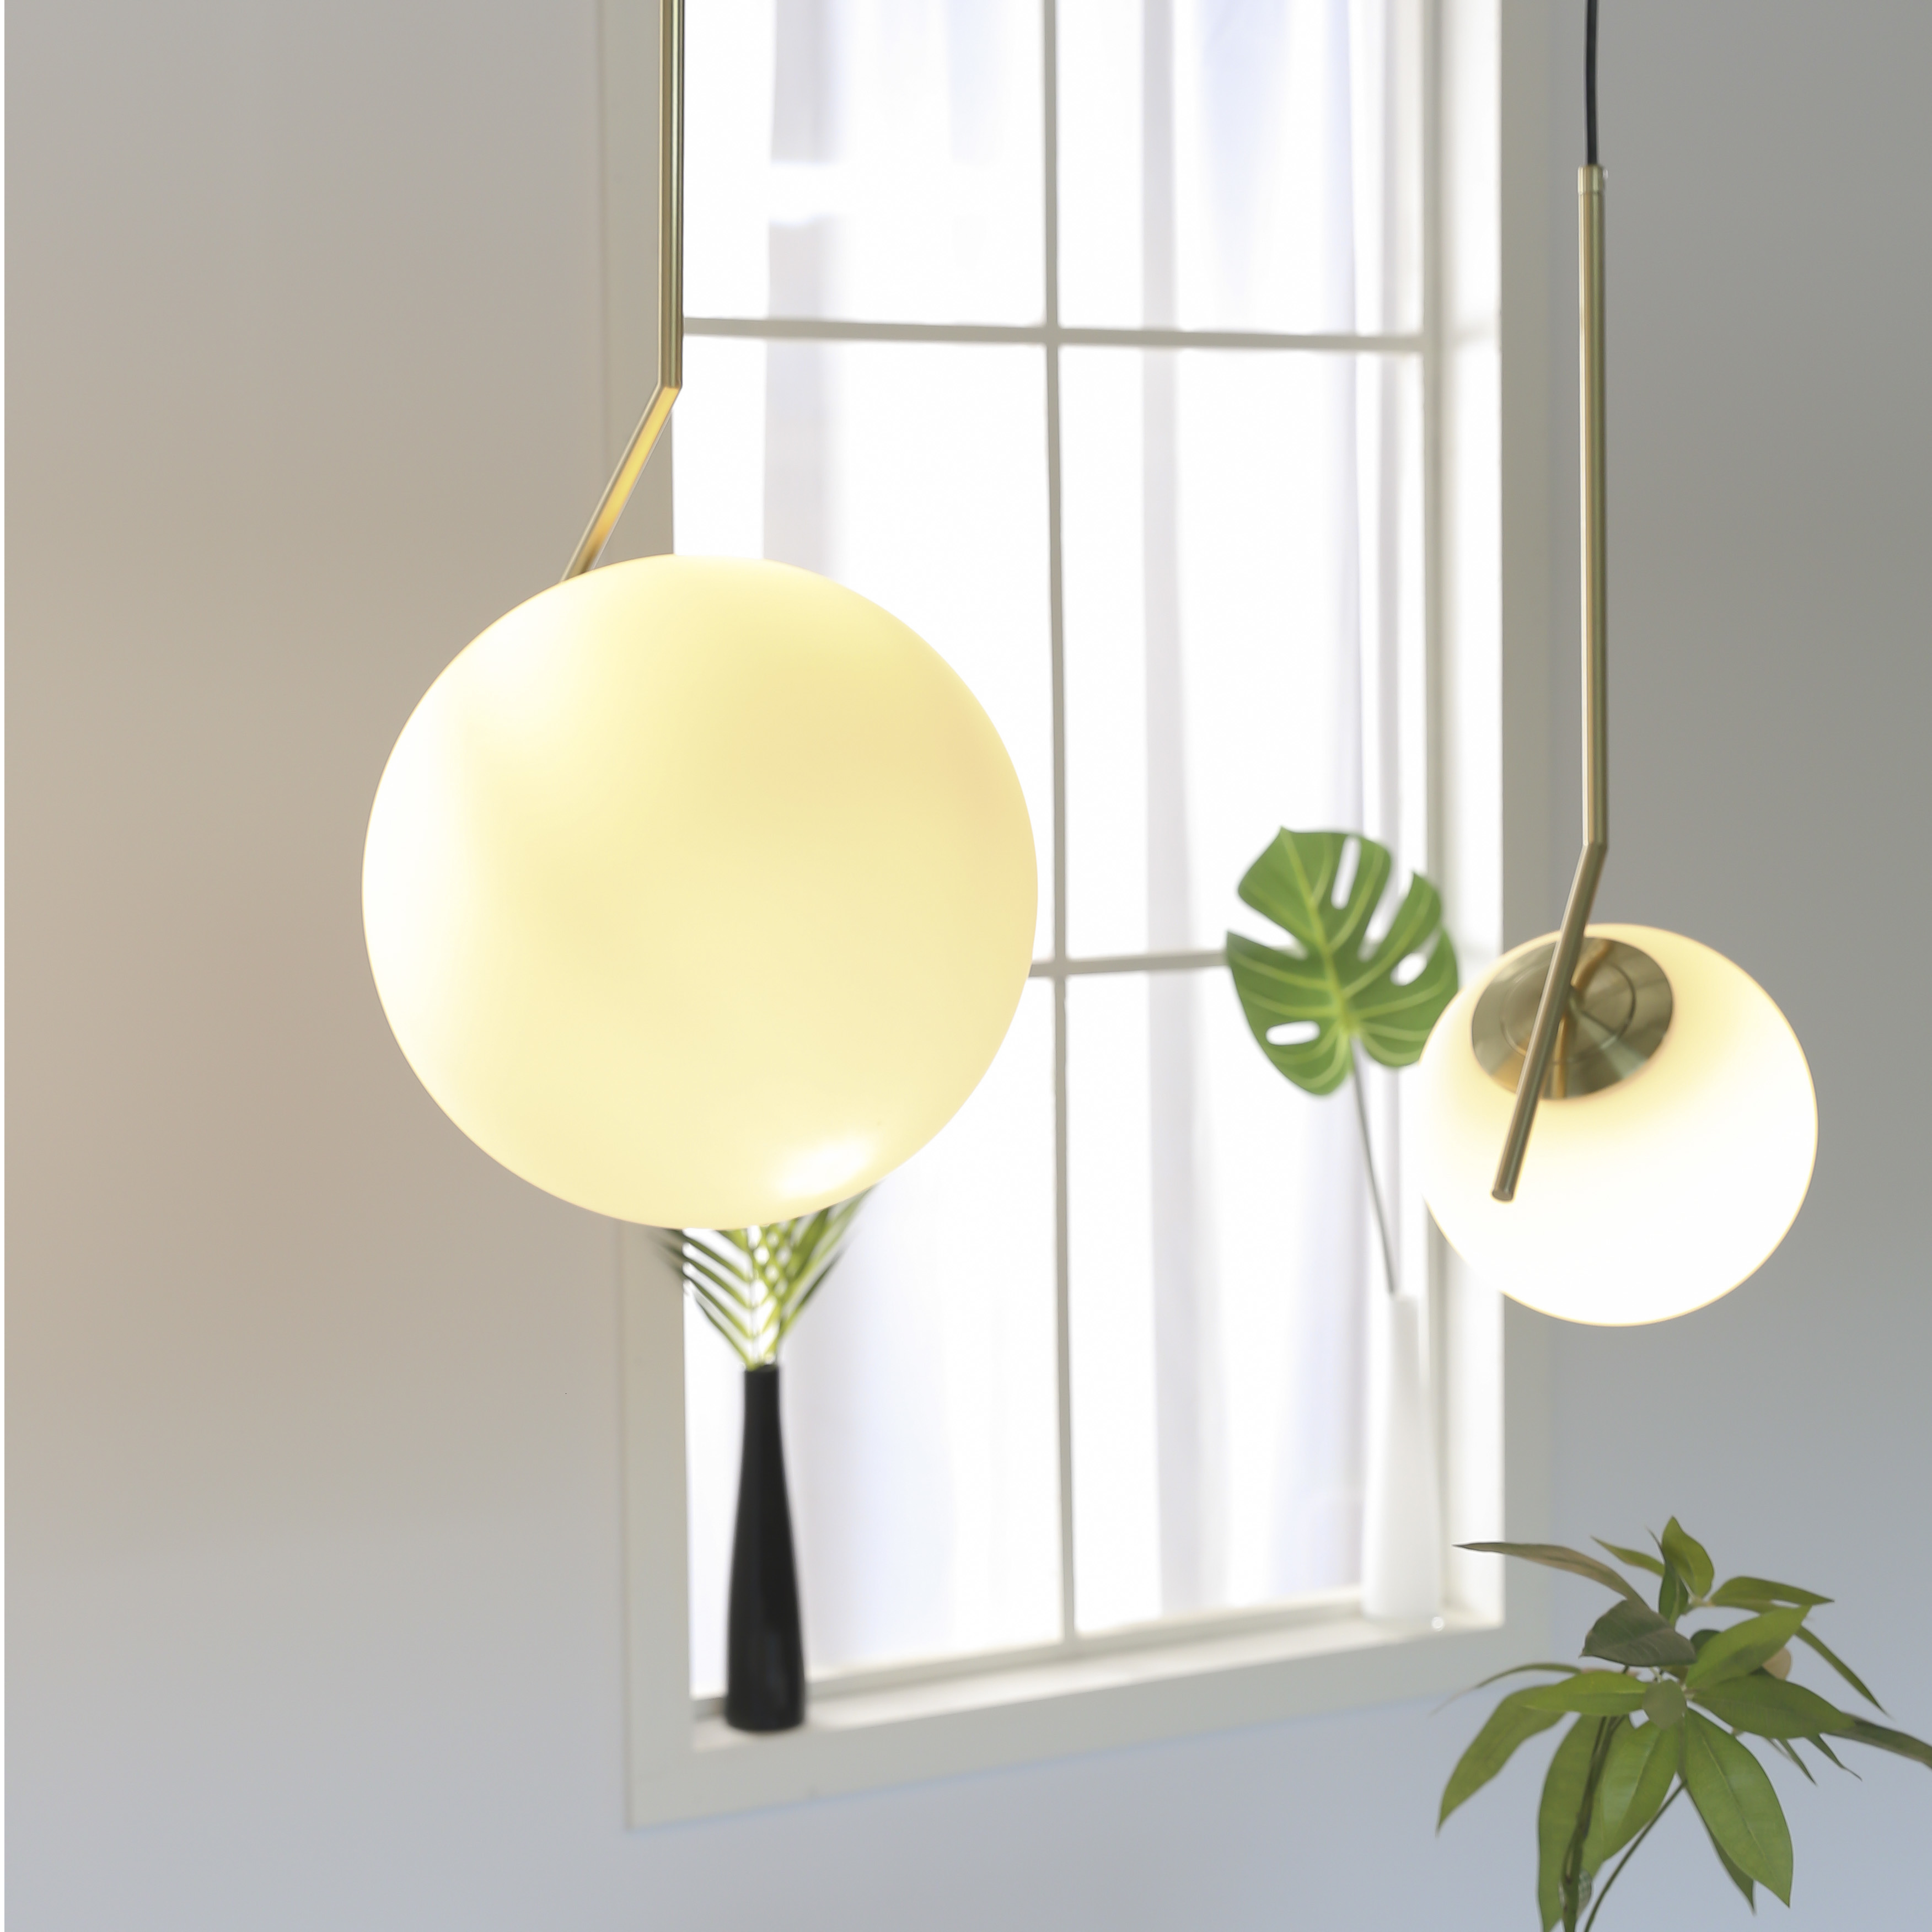 Electric Power Source Indoor Lightings Glass Globe Pendant Hotel Light kitchen chandelier|Pendant Lights| |  - title=